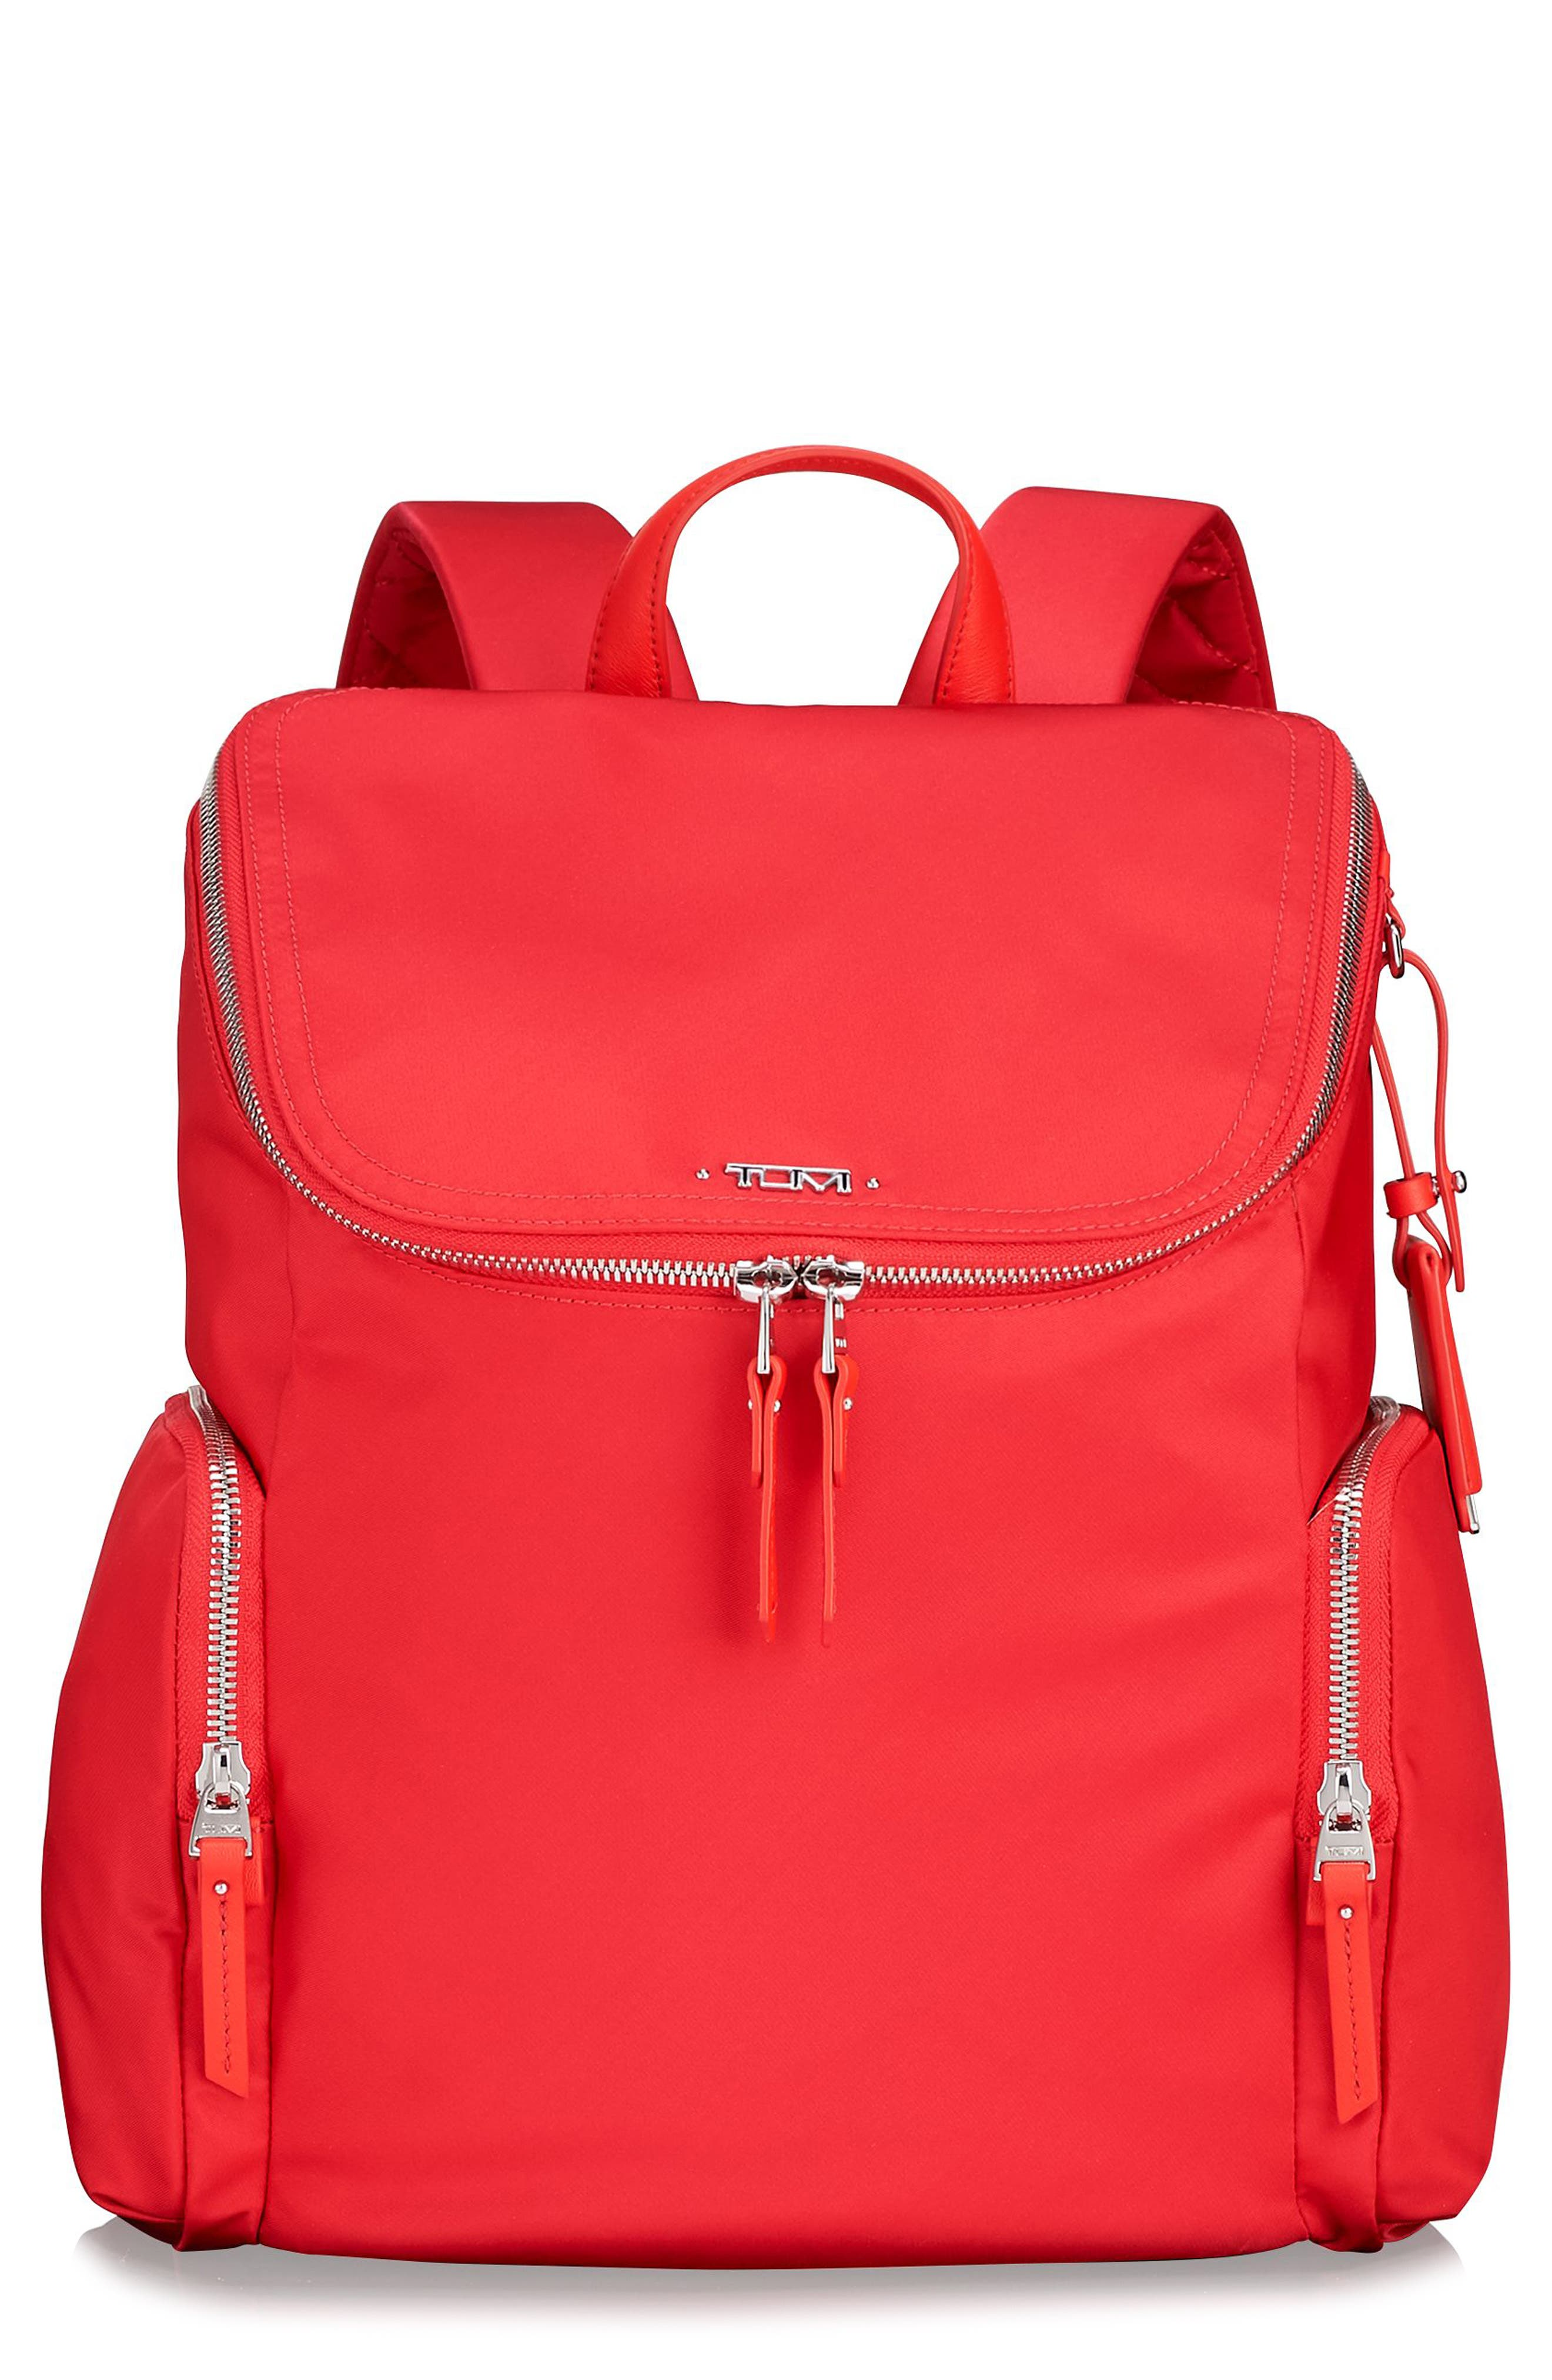 Voyageur Lexa Nylon Backpack,                             Main thumbnail 4, color,